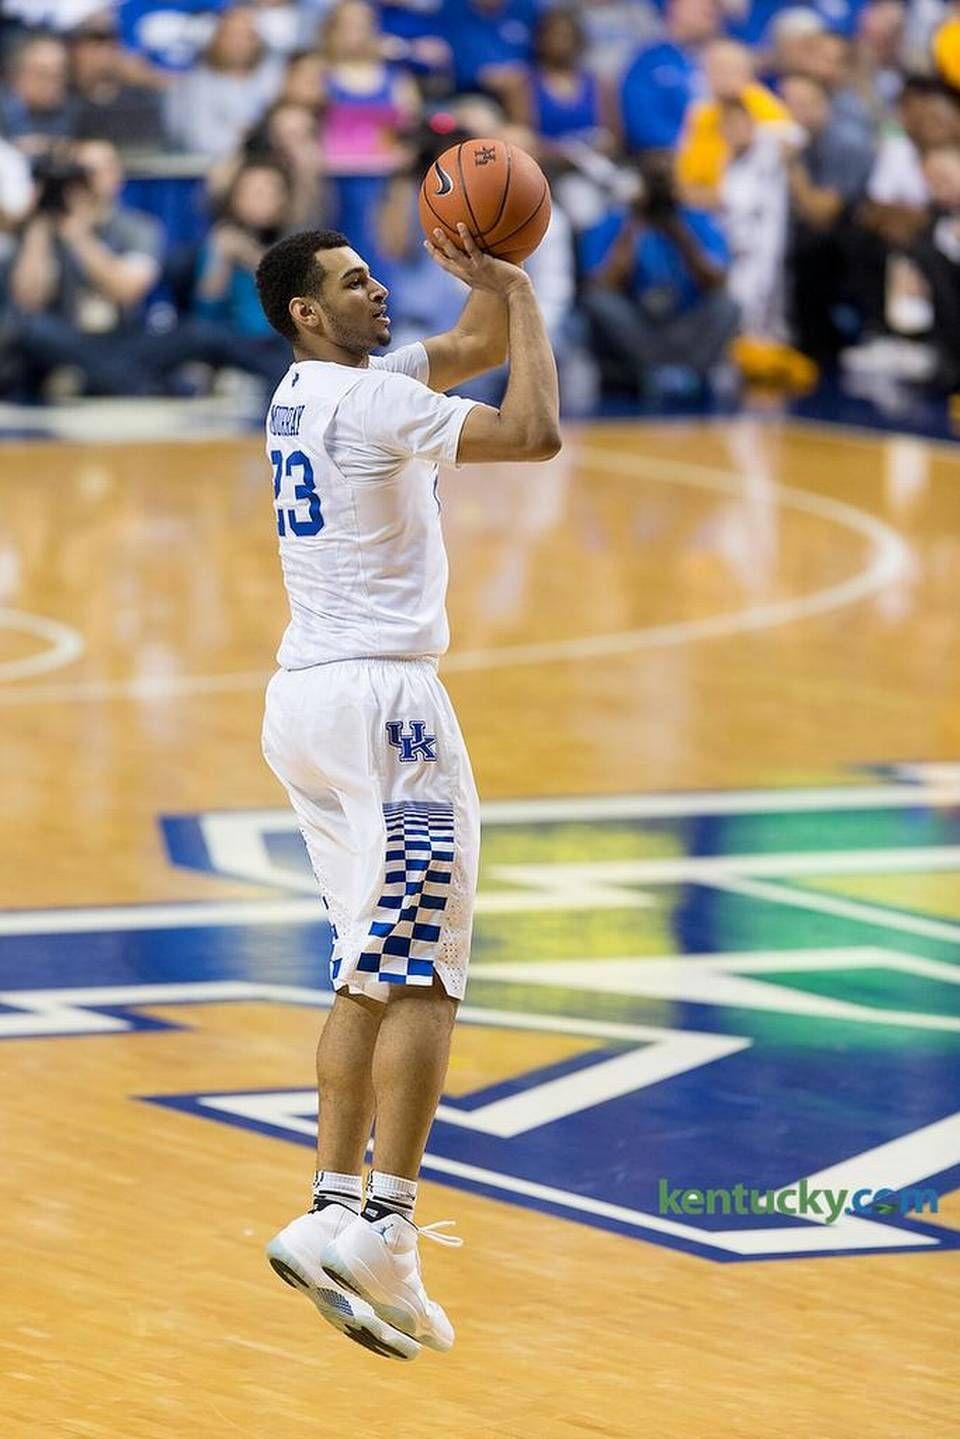 Best 25+ Kentucky basketball score ideas on Pinterest | Uk ...